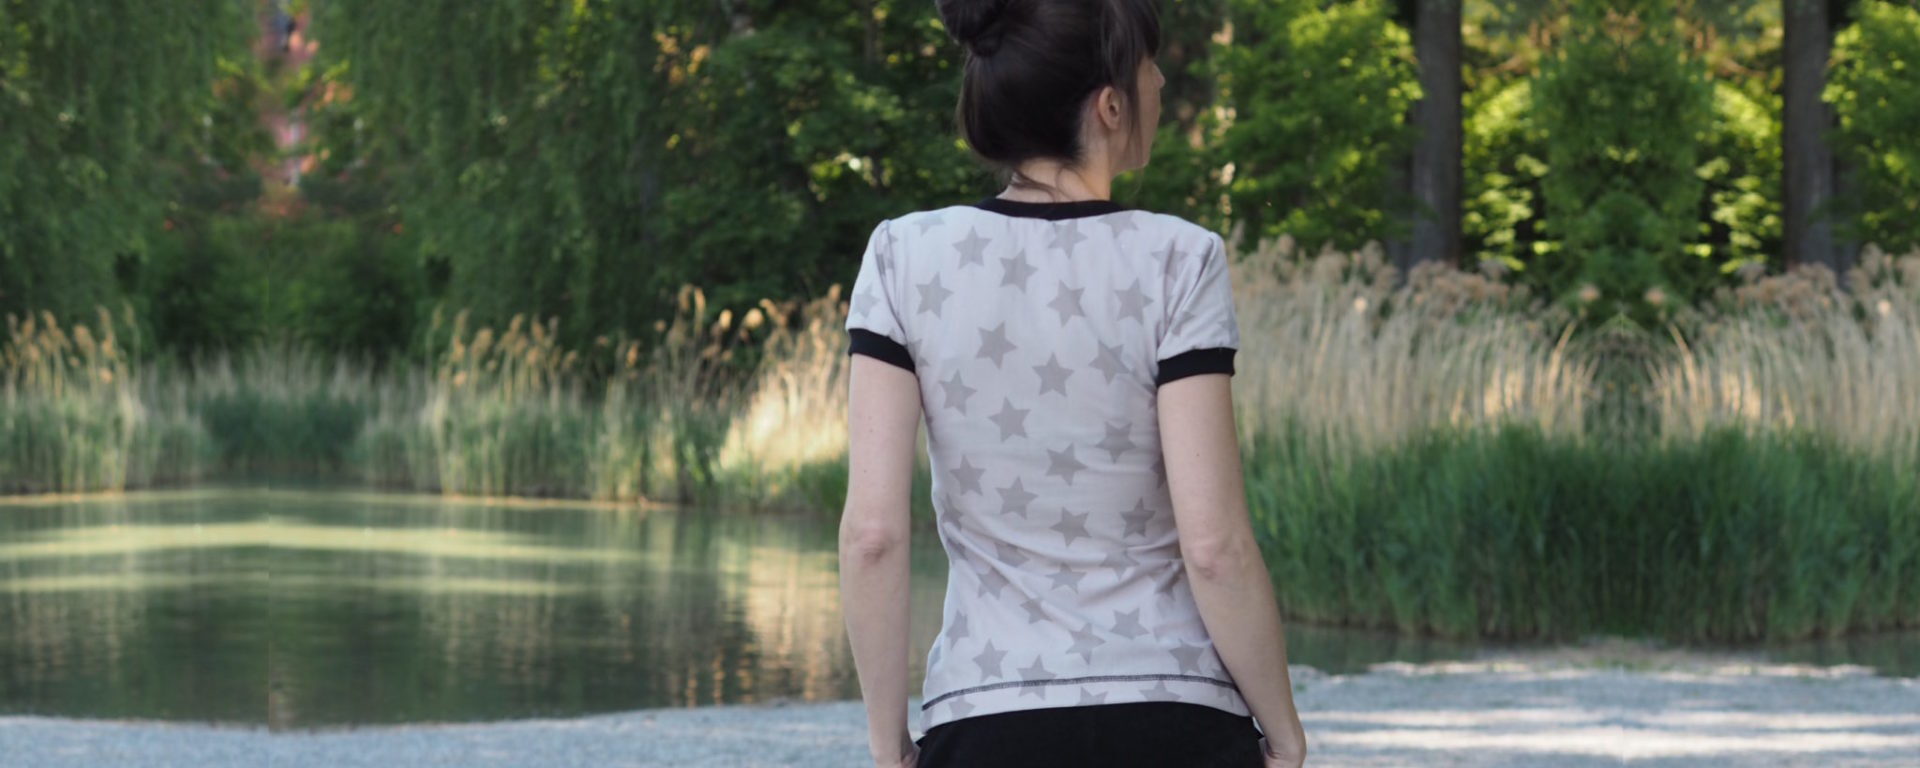 Schnittmuster Shirt Venla Textilsucht nähen 3 titel